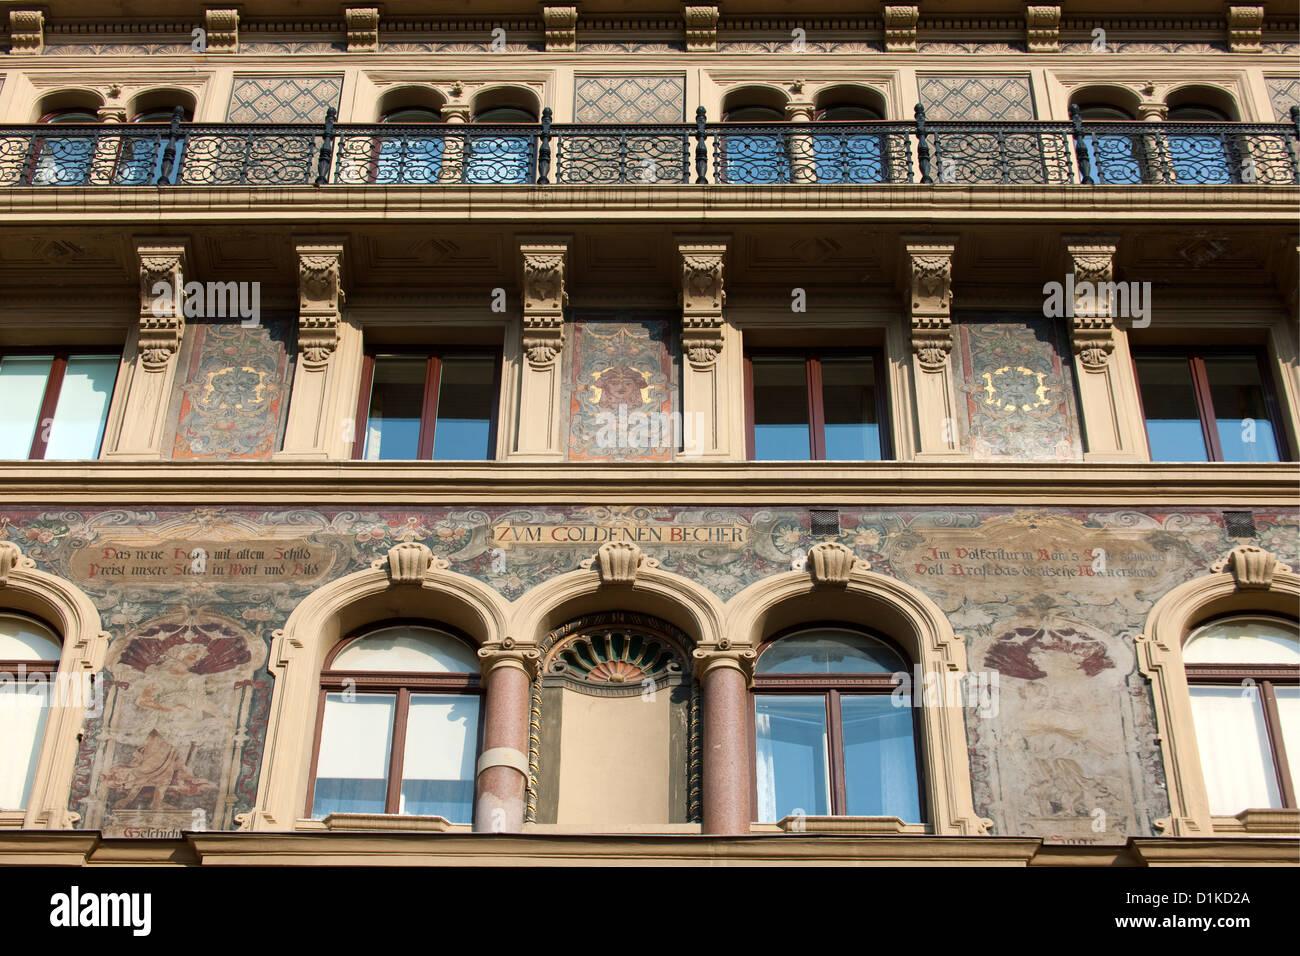 Haus Zum Haus Stockfotos & Haus Zum Haus Bilder - Alamy